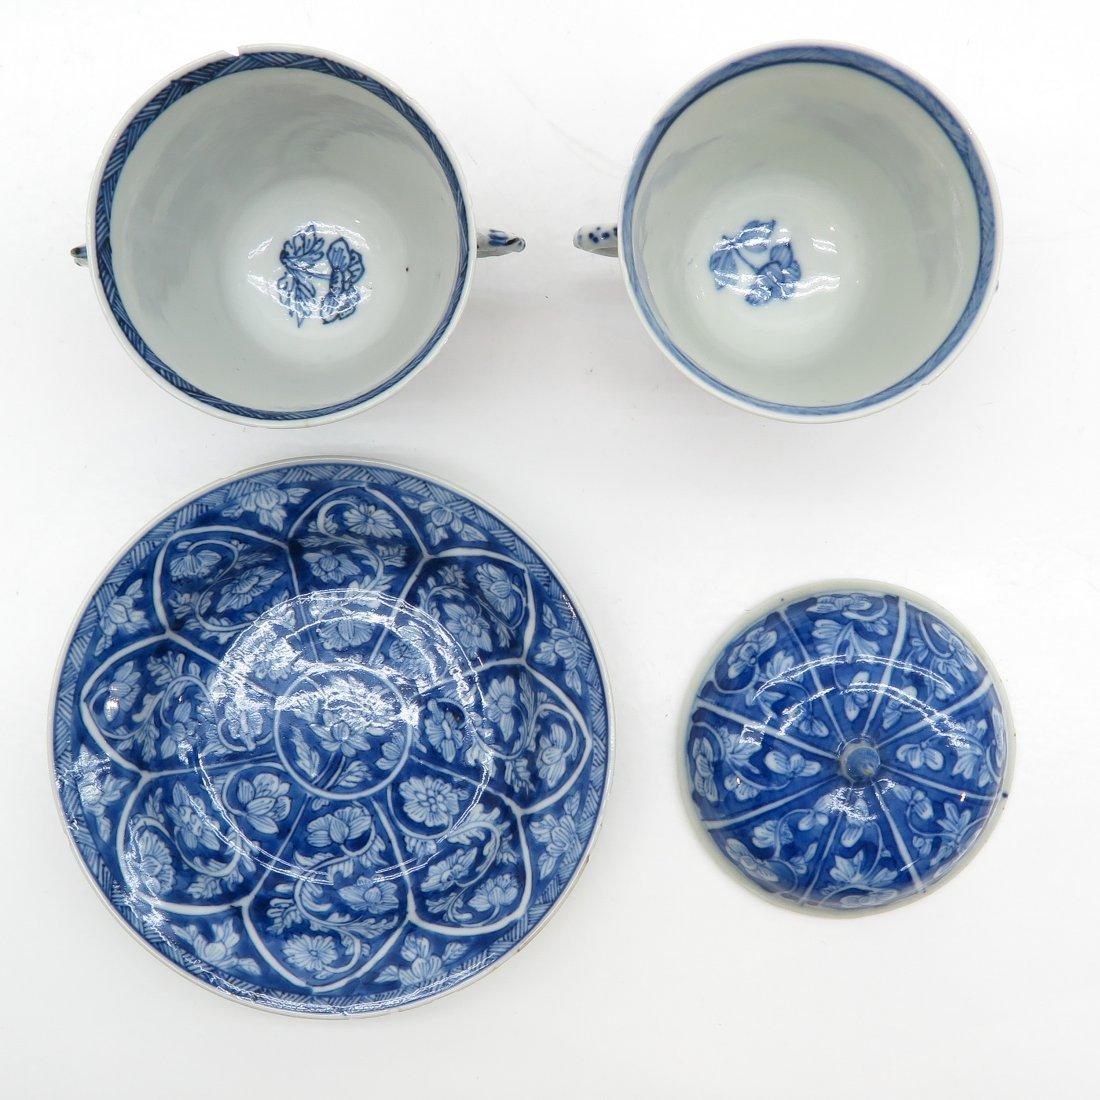 Lot of China Porcelain - 2